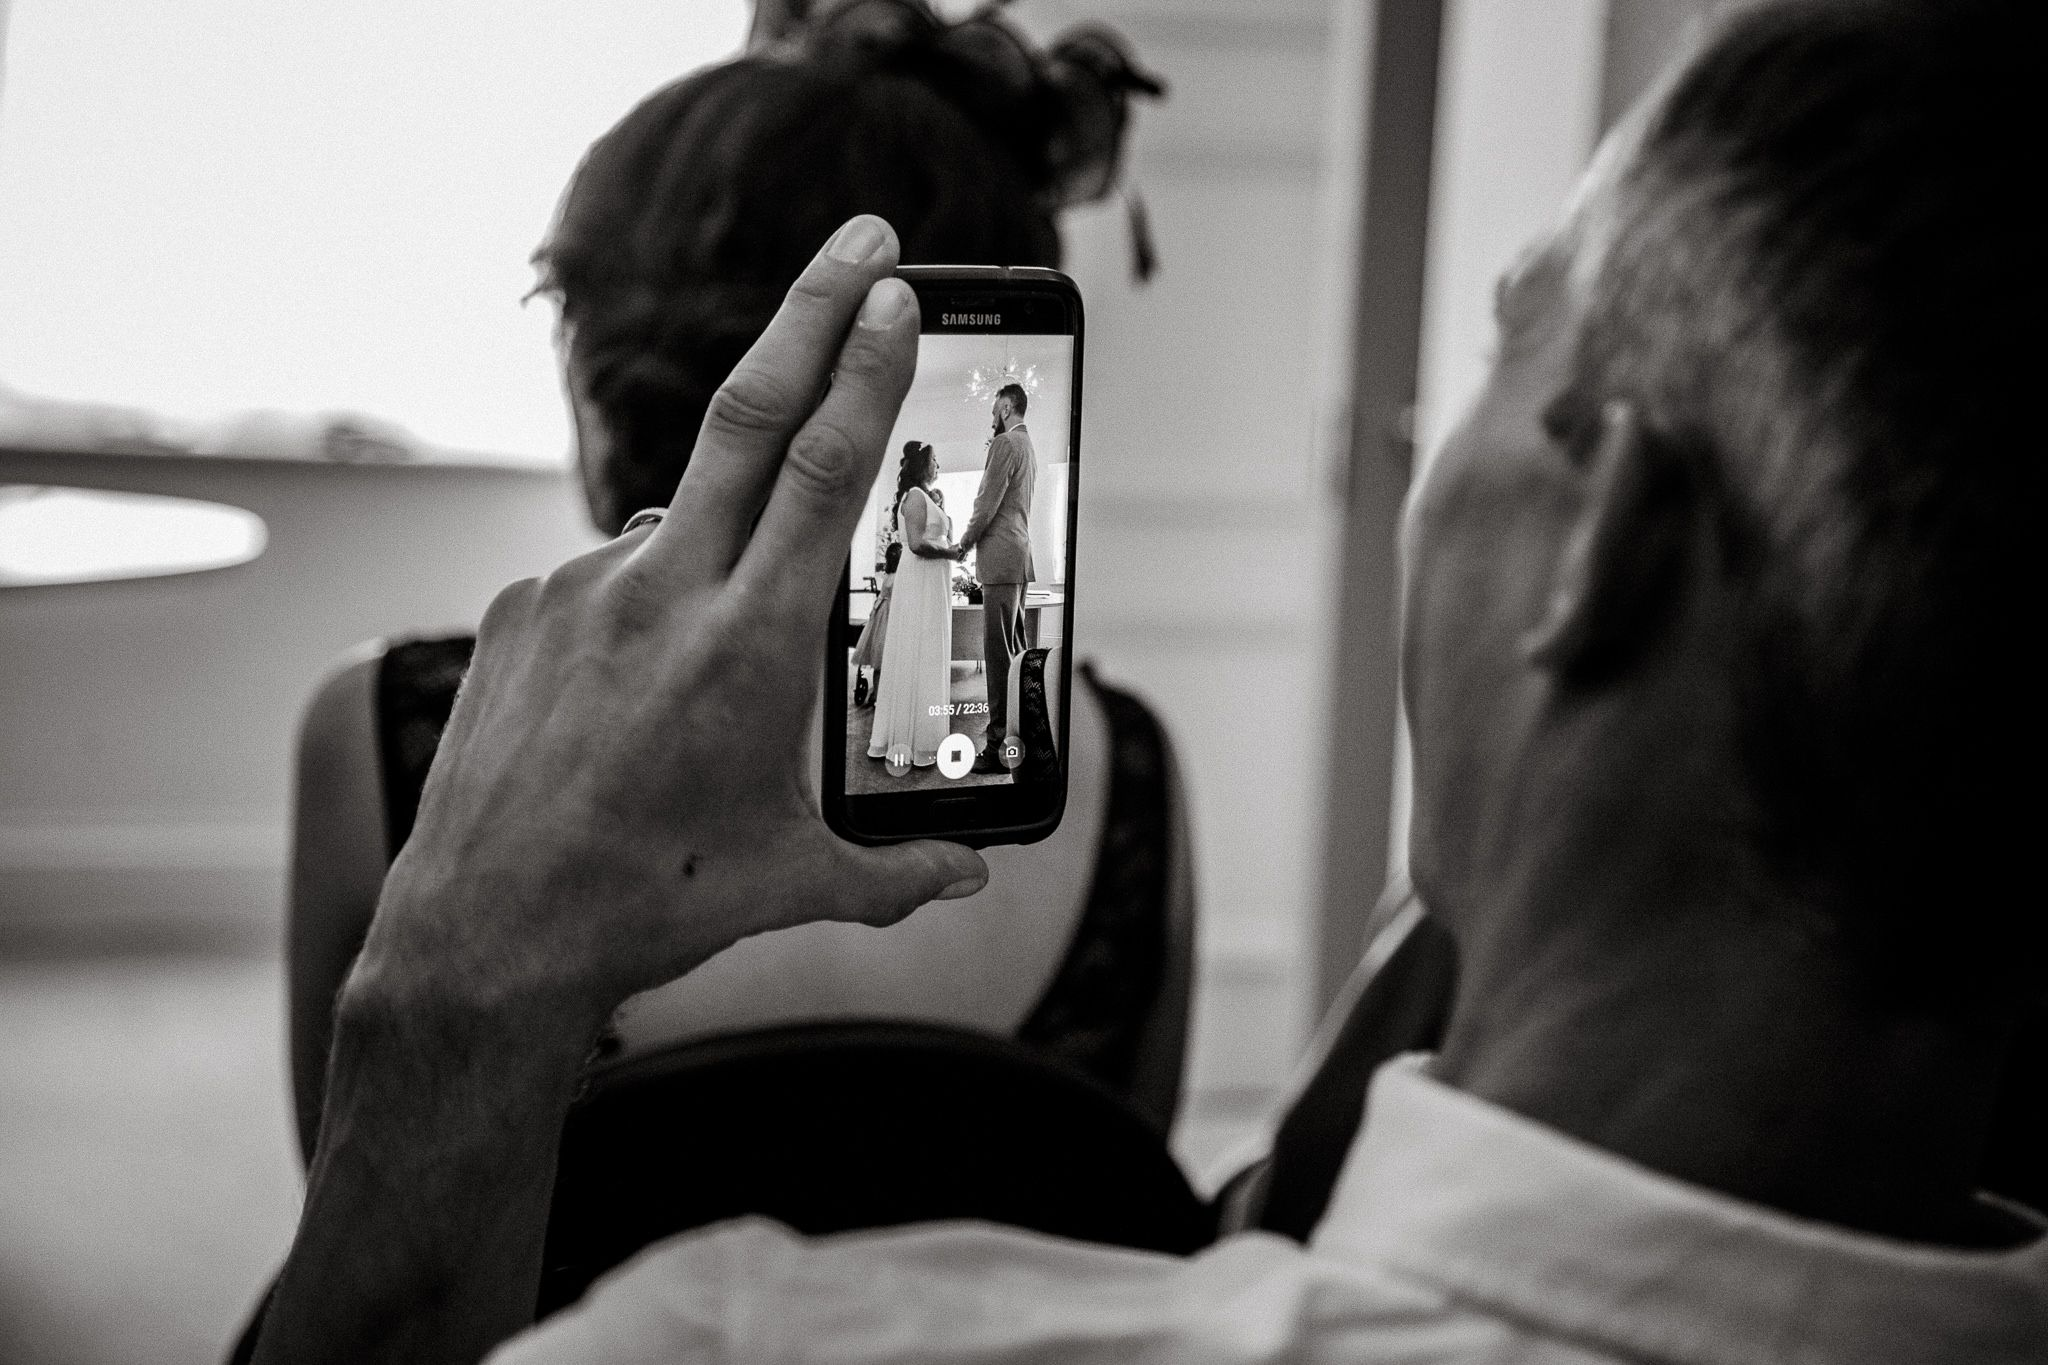 lincolnshire-documentary-wedding-photographer-3.jpg